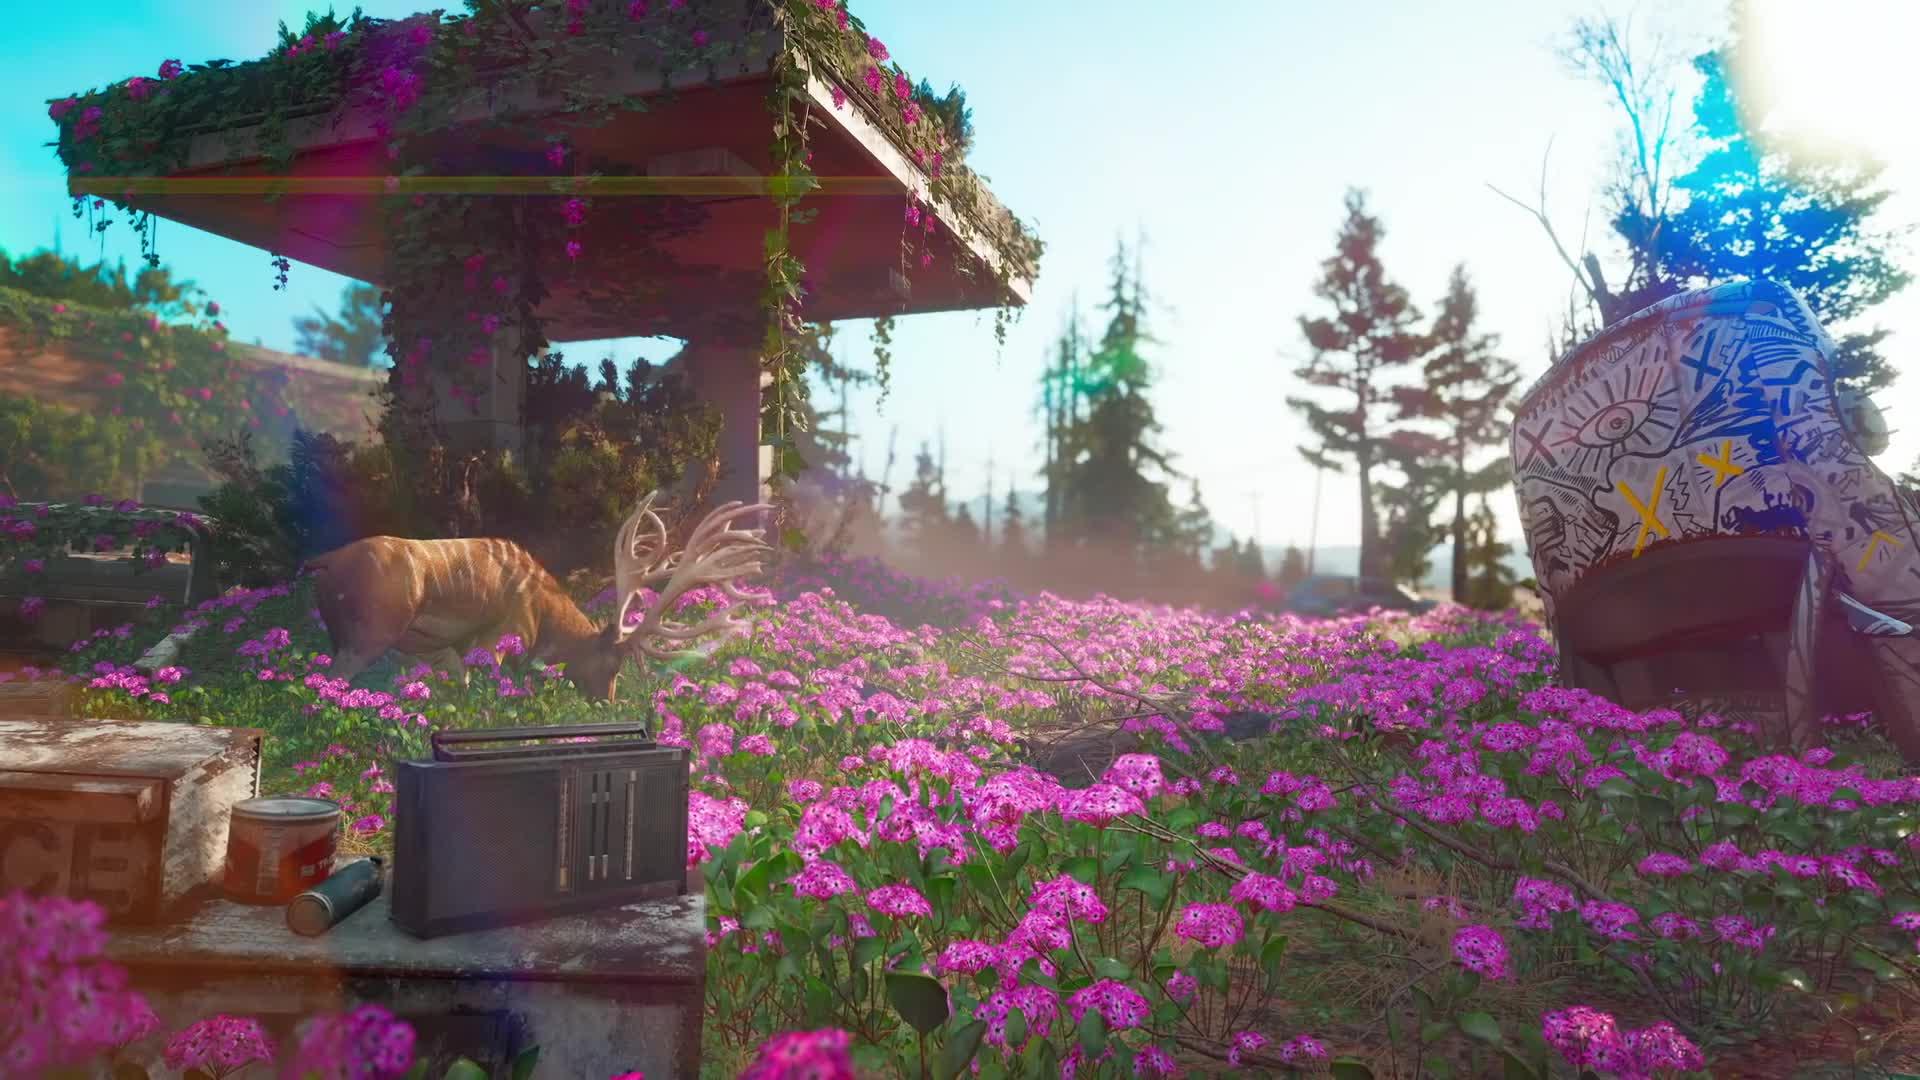 Trailer, Ego-Shooter, Ubisoft, Far Cry, Game Awards, Game Awards 2018, Far Cry New Dawn, New Dawn